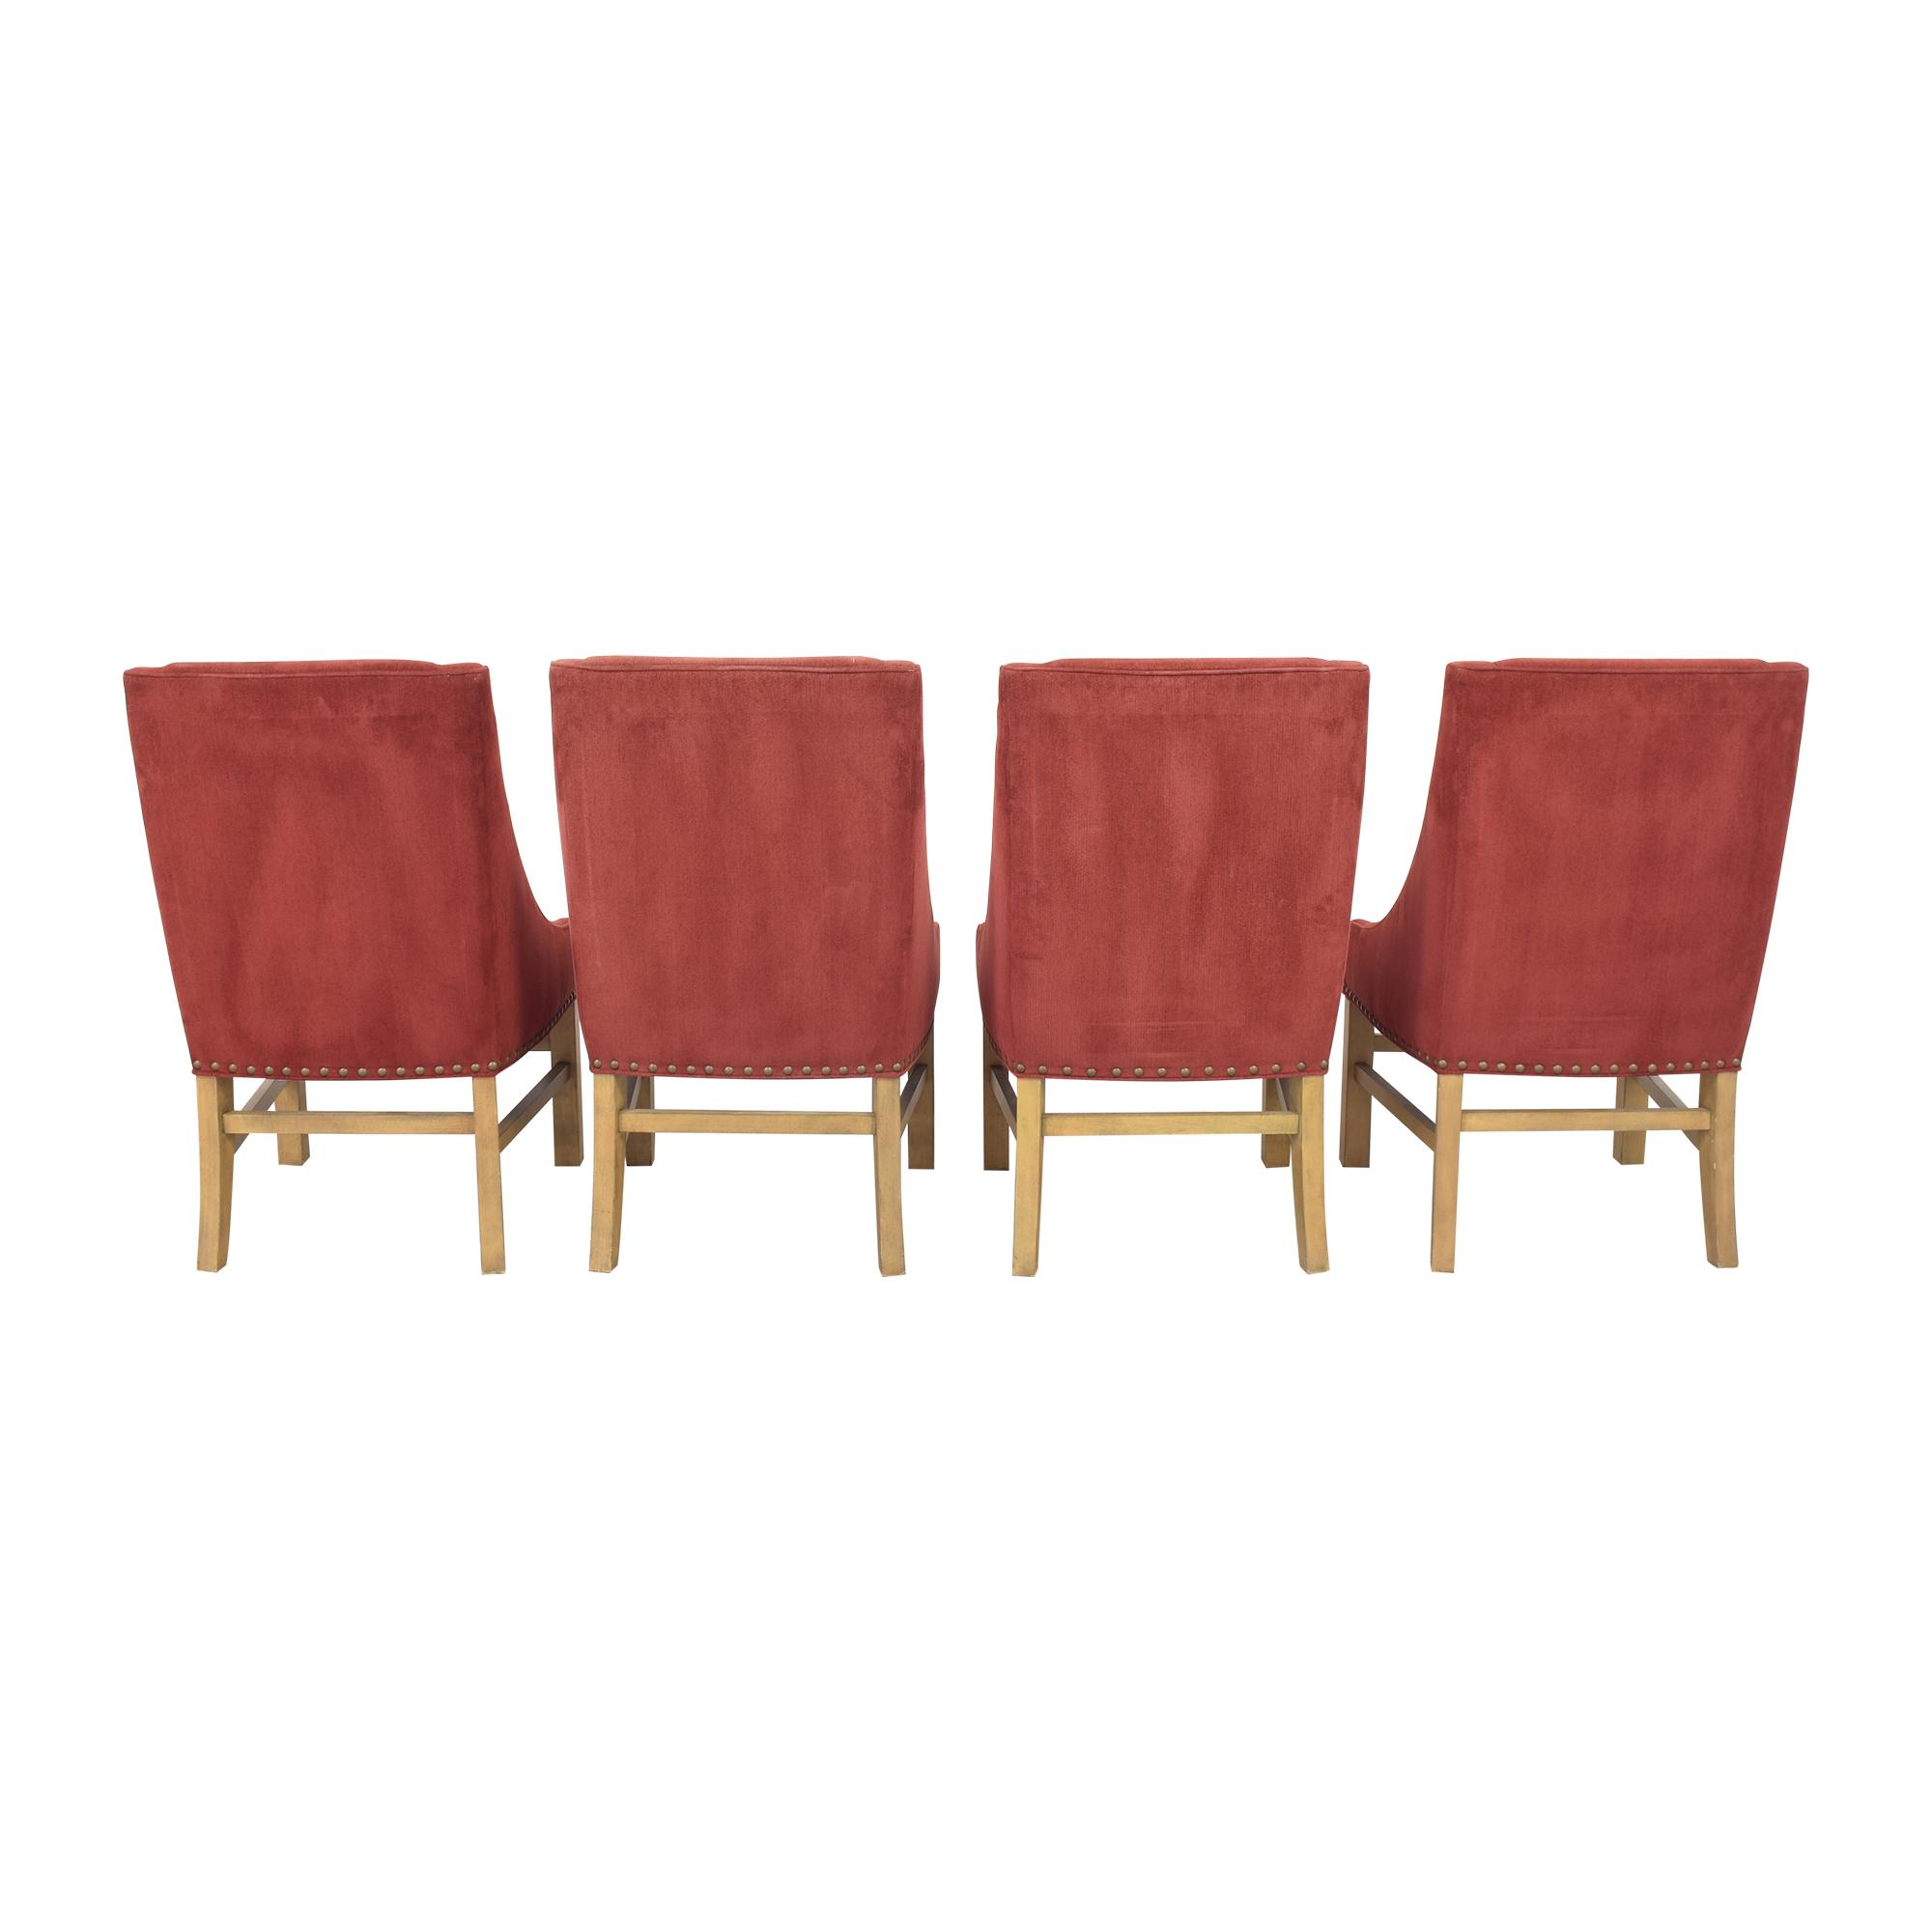 Bernhardt Bernhardt Upholstered Dining Chairs on sale